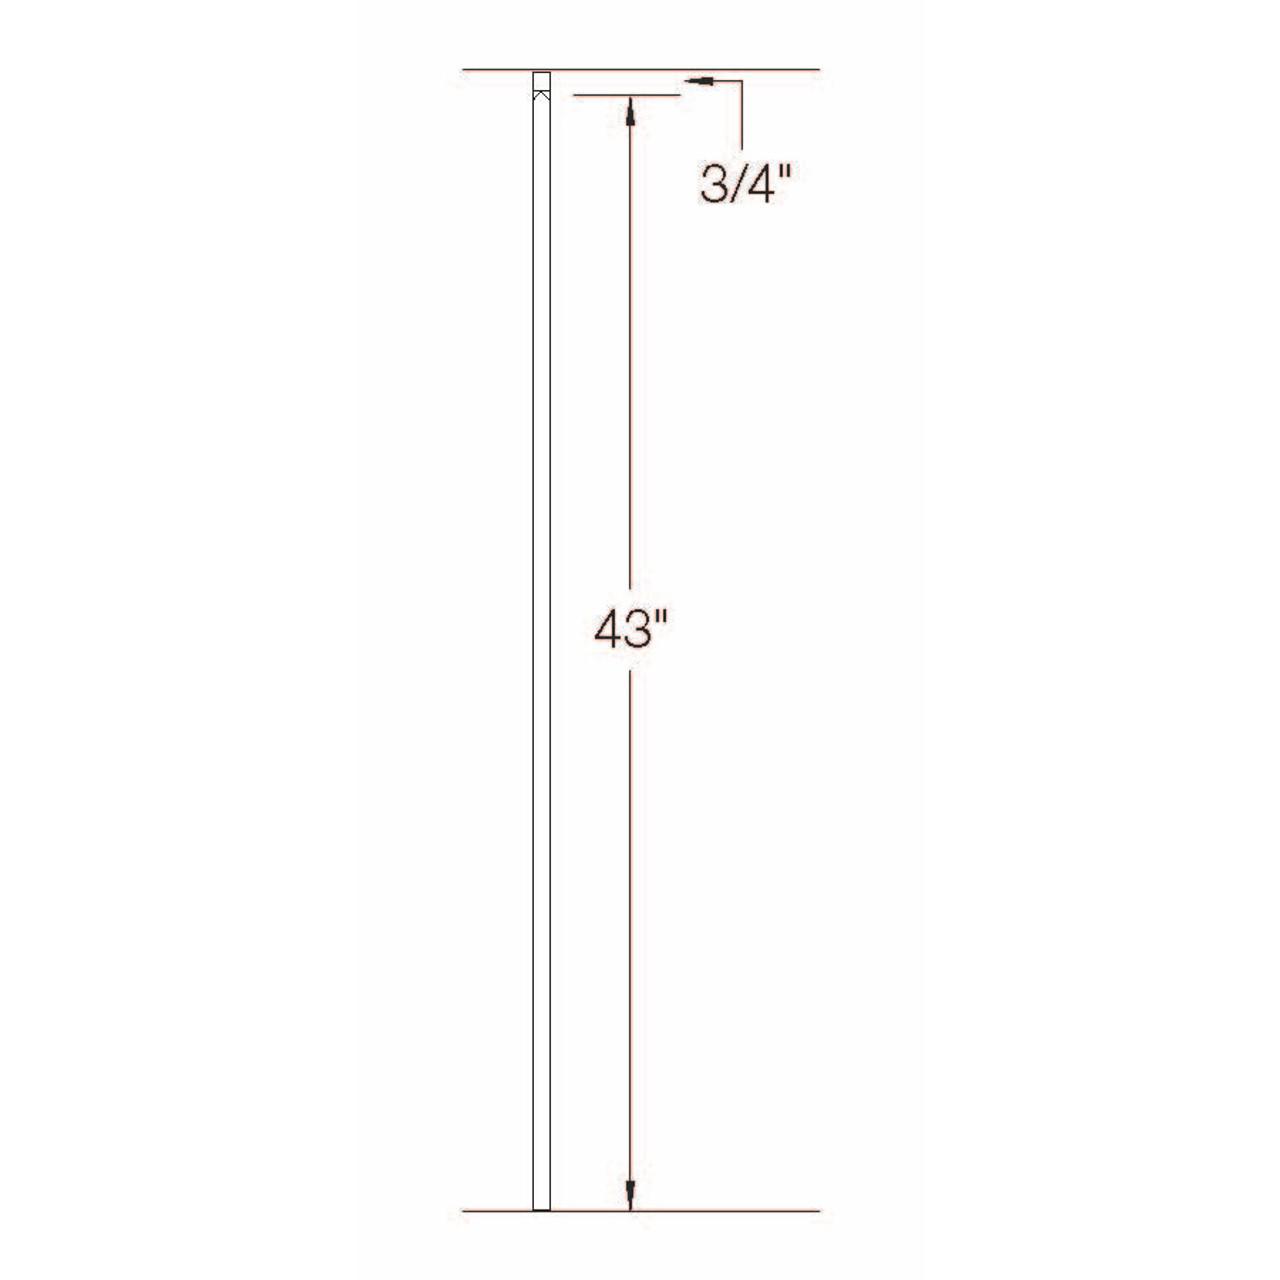 2G01 16mm Plain Bar, Tubular Steel Dimensional Information